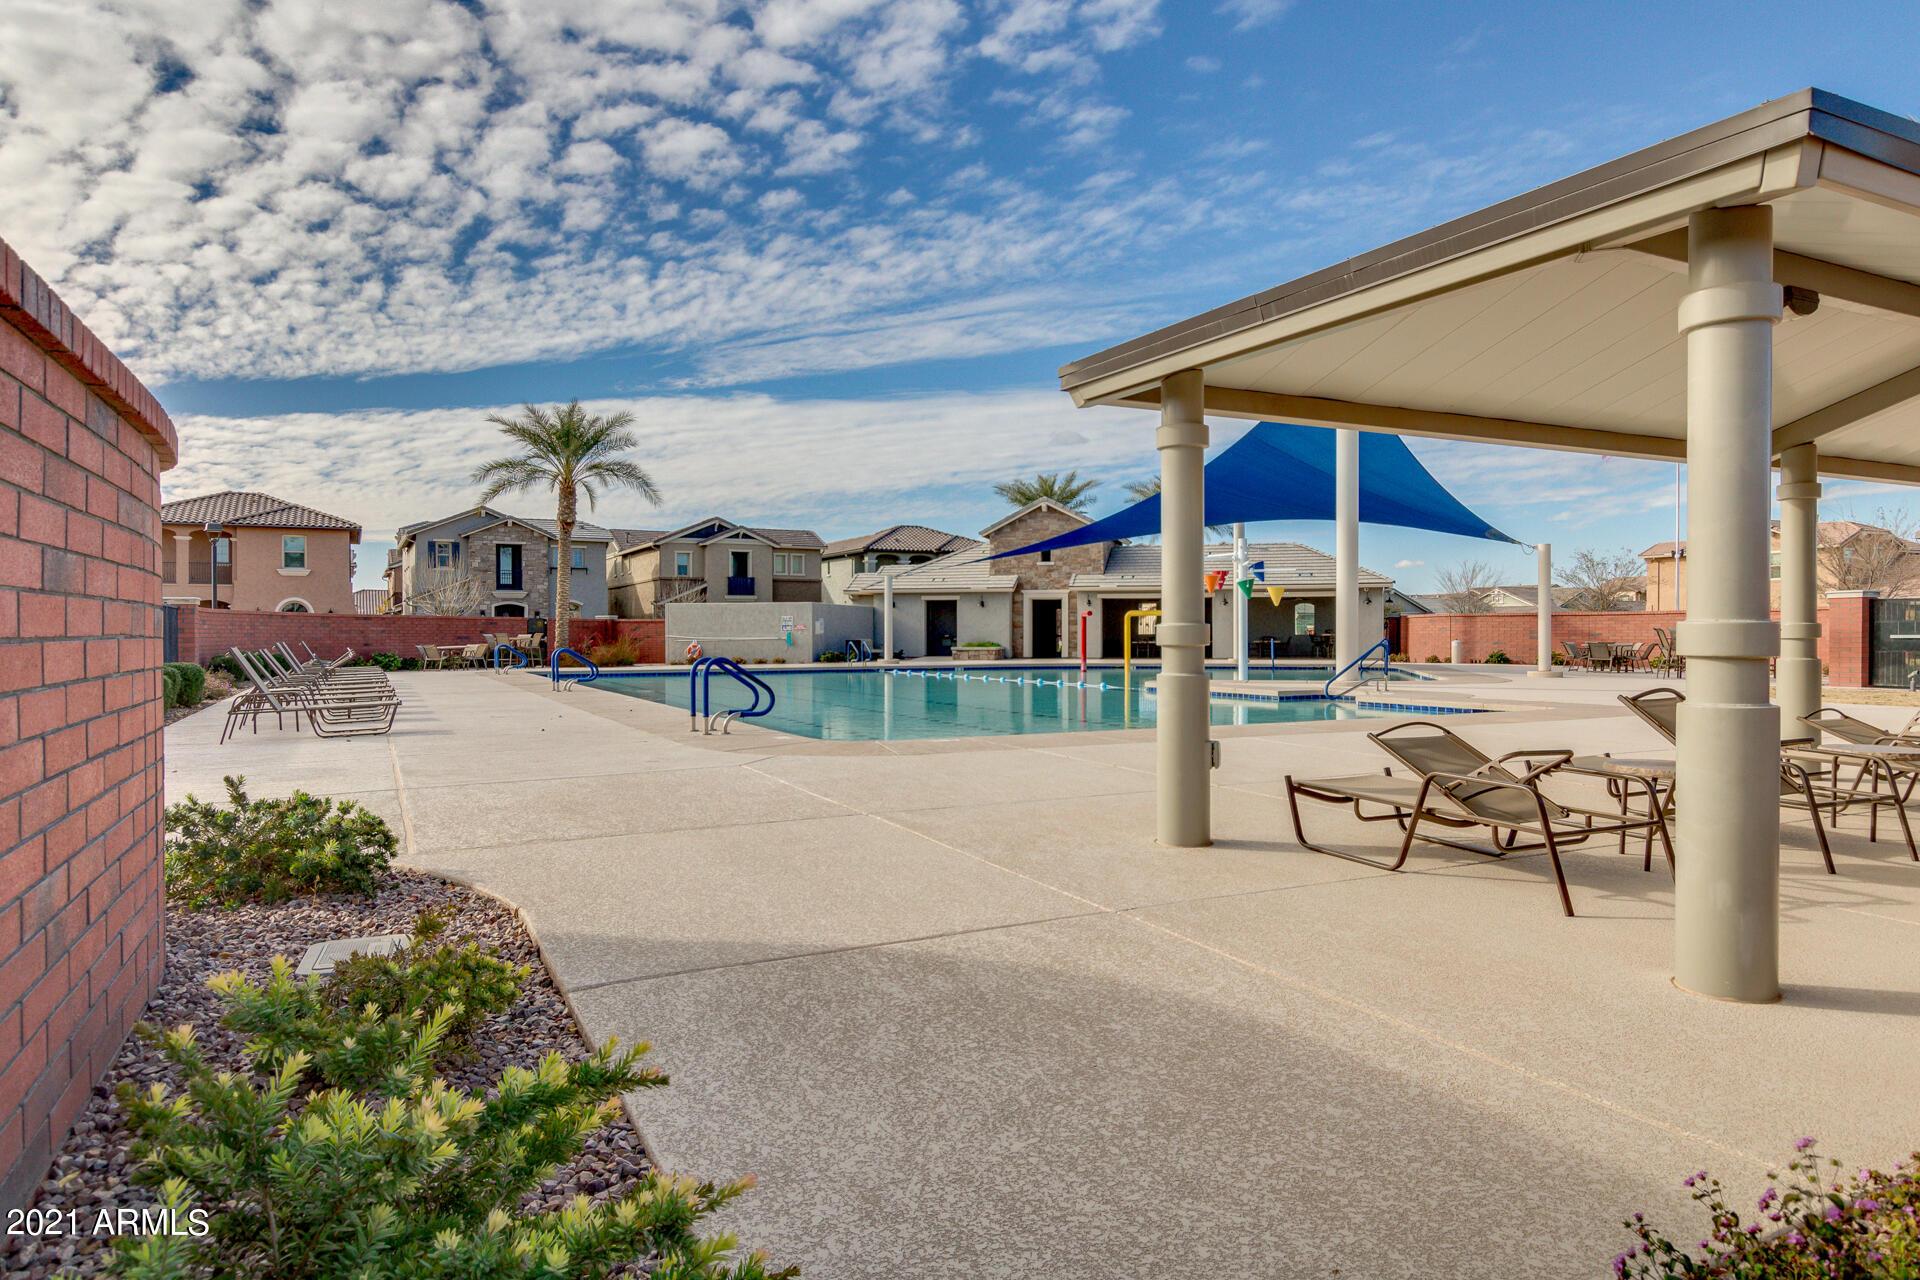 MLS 6307603 4323 E Wheaton Street, Gilbert, AZ 85295 Eco-Friendly Homes